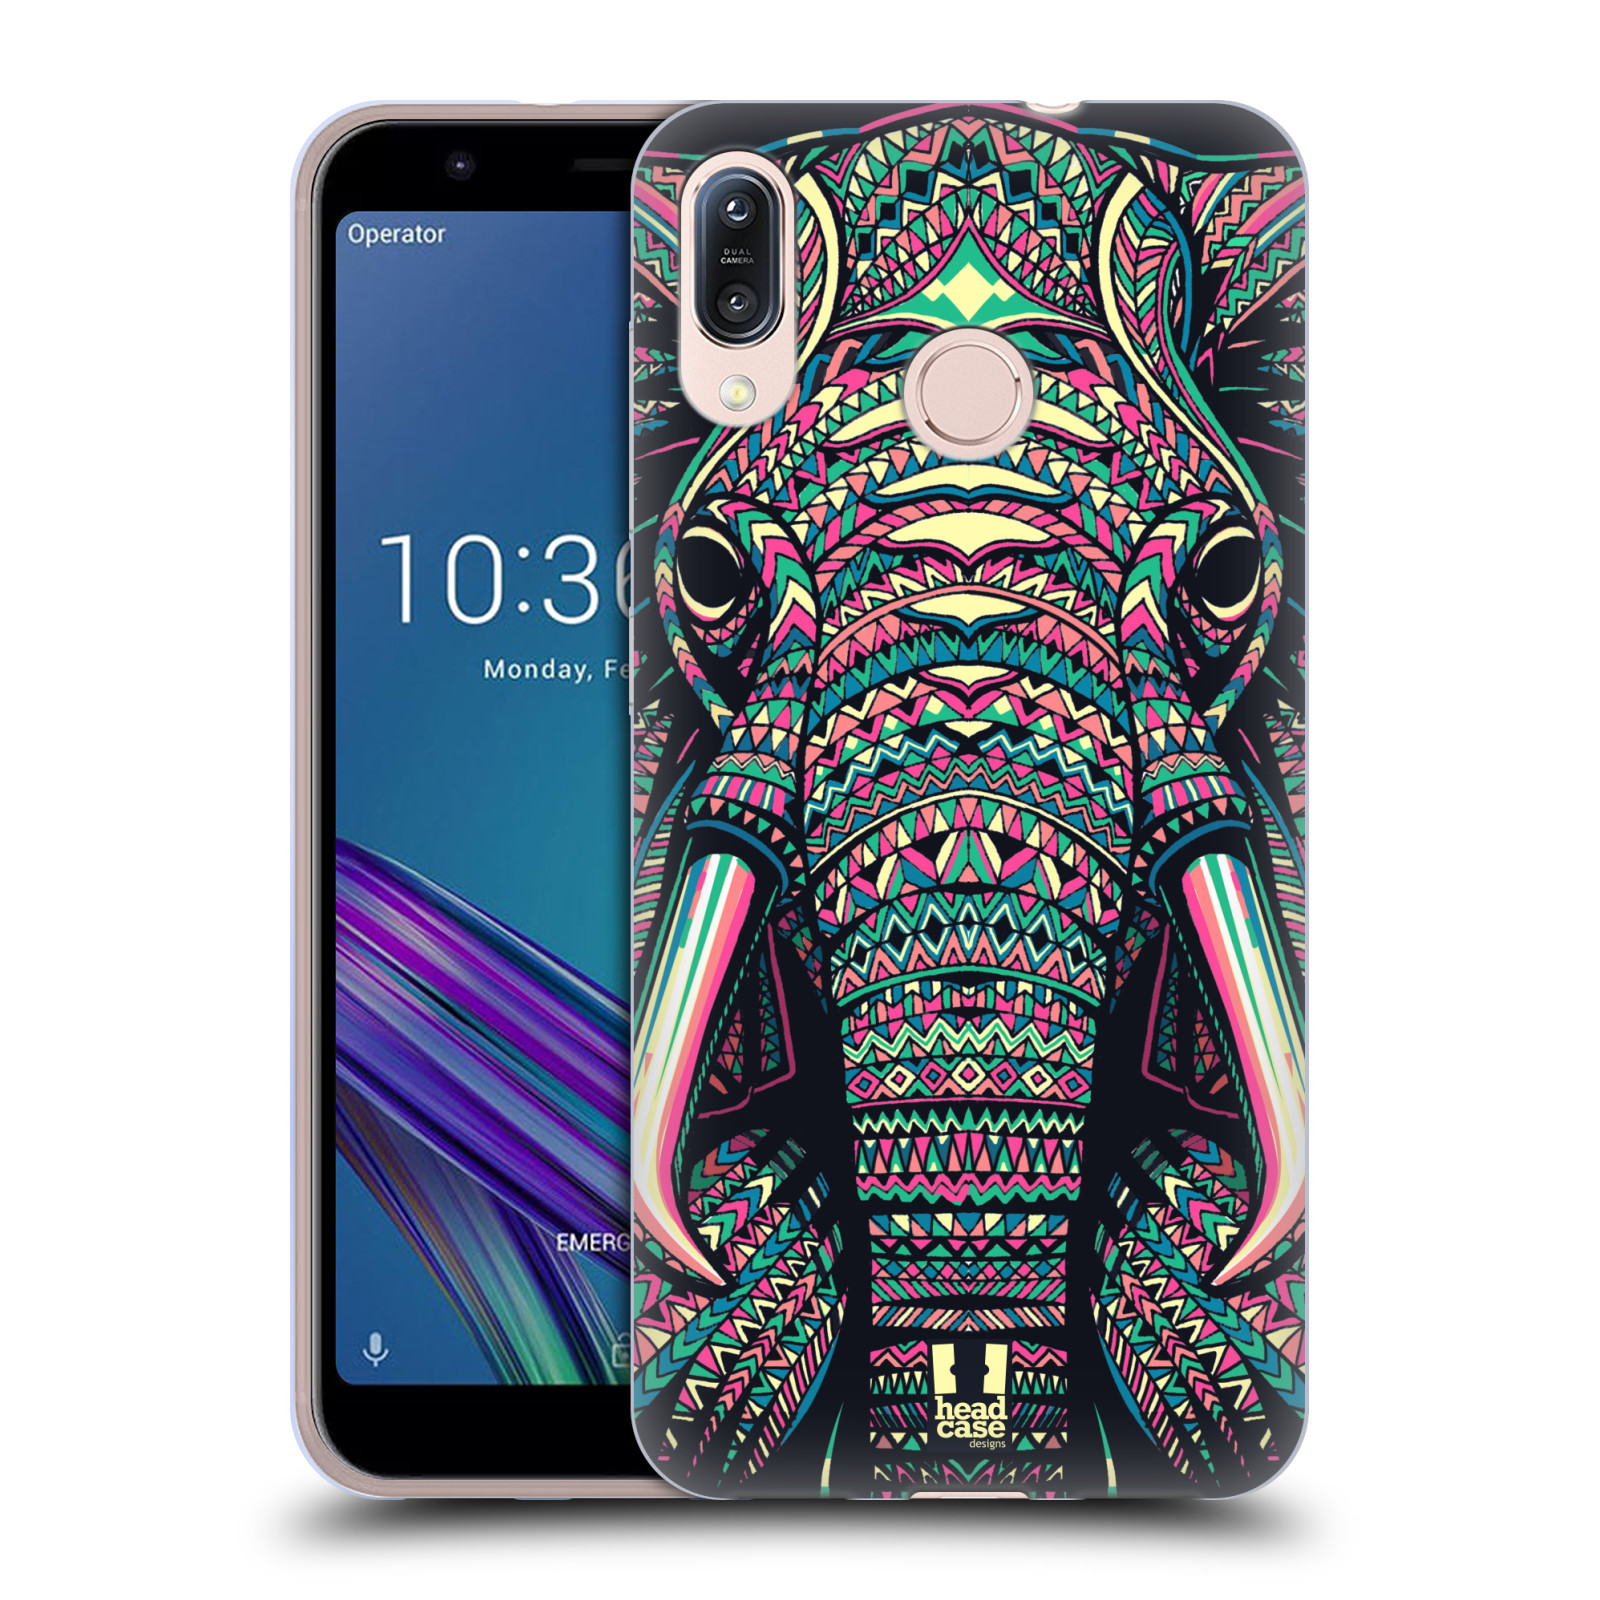 Silikonové pouzdro na mobil Asus Zenfone Max M1 ZB555KL - Head Case - AZTEC SLON